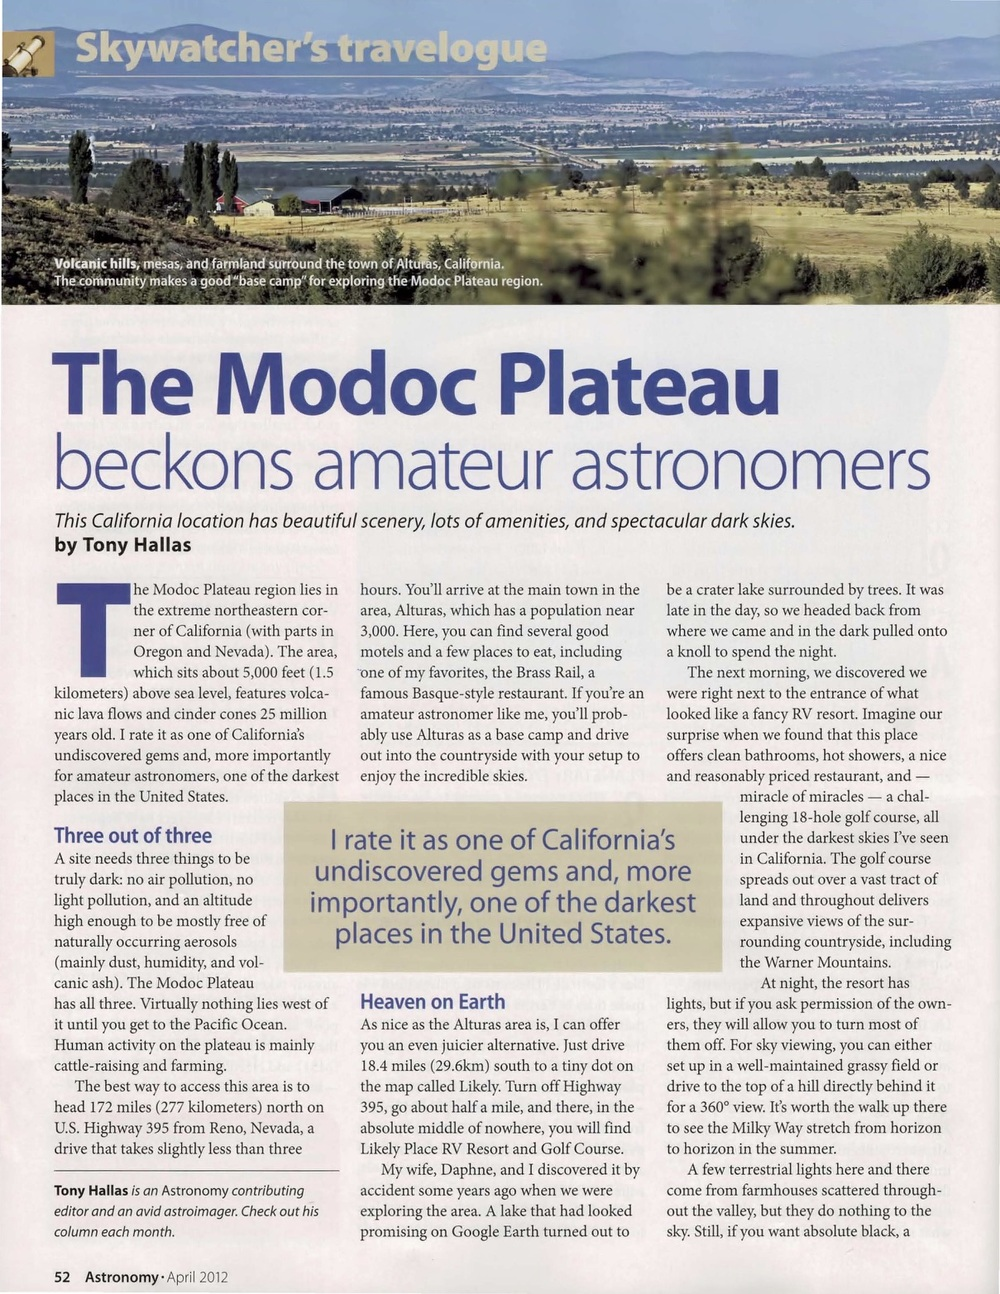 astronomy-april-2012.jpg